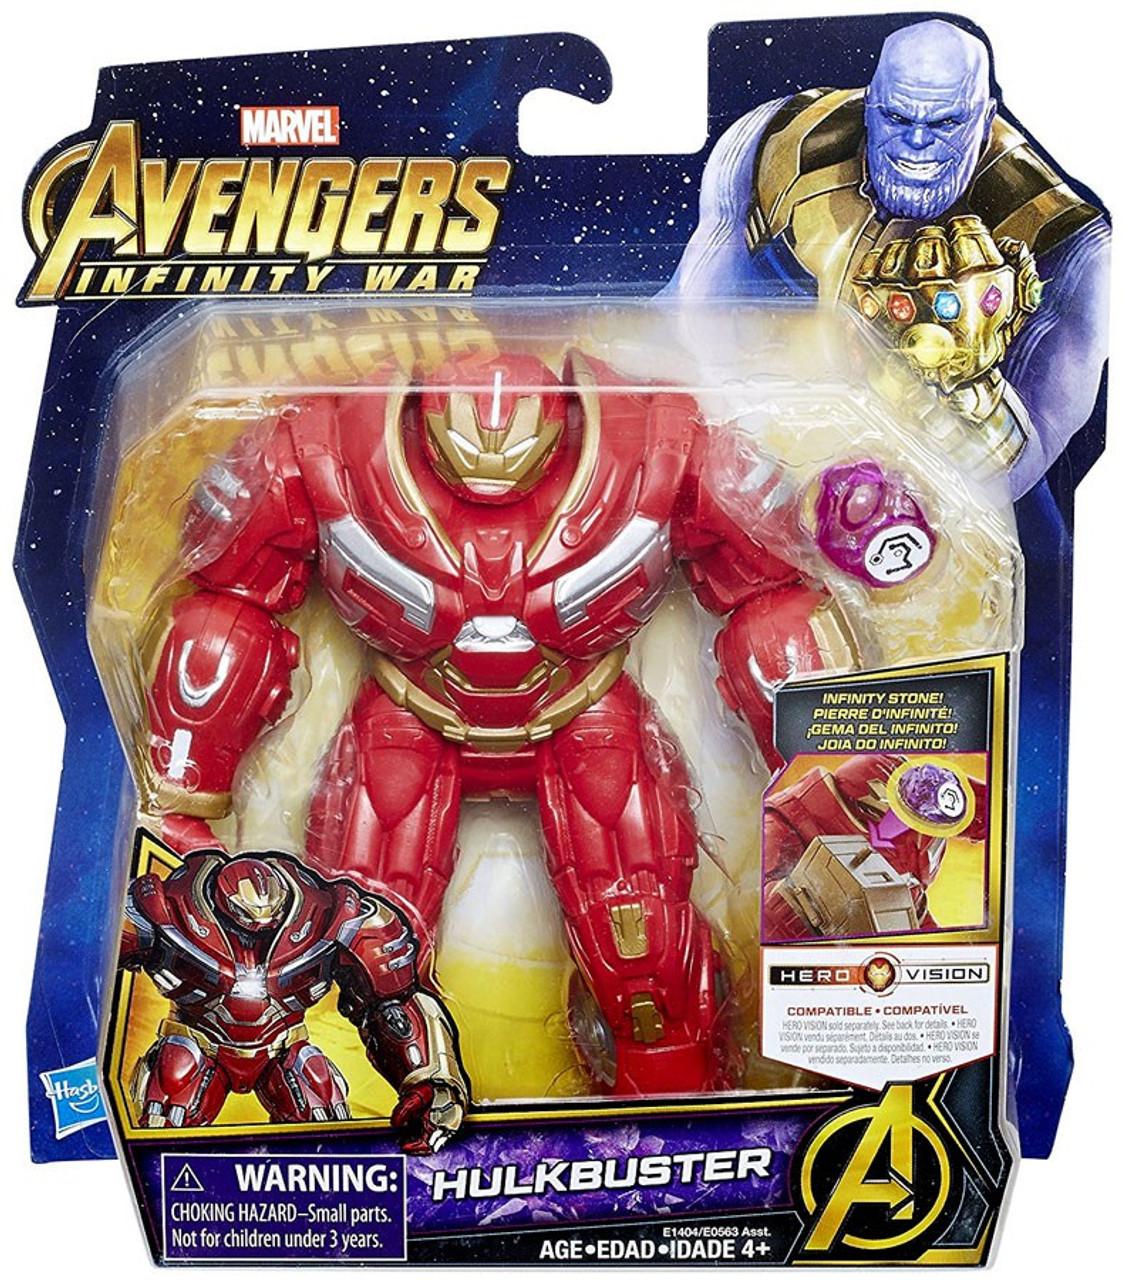 7ffa550644c Marvel Avengers Infinity War Hulkbuster Action Figure with Stone ...